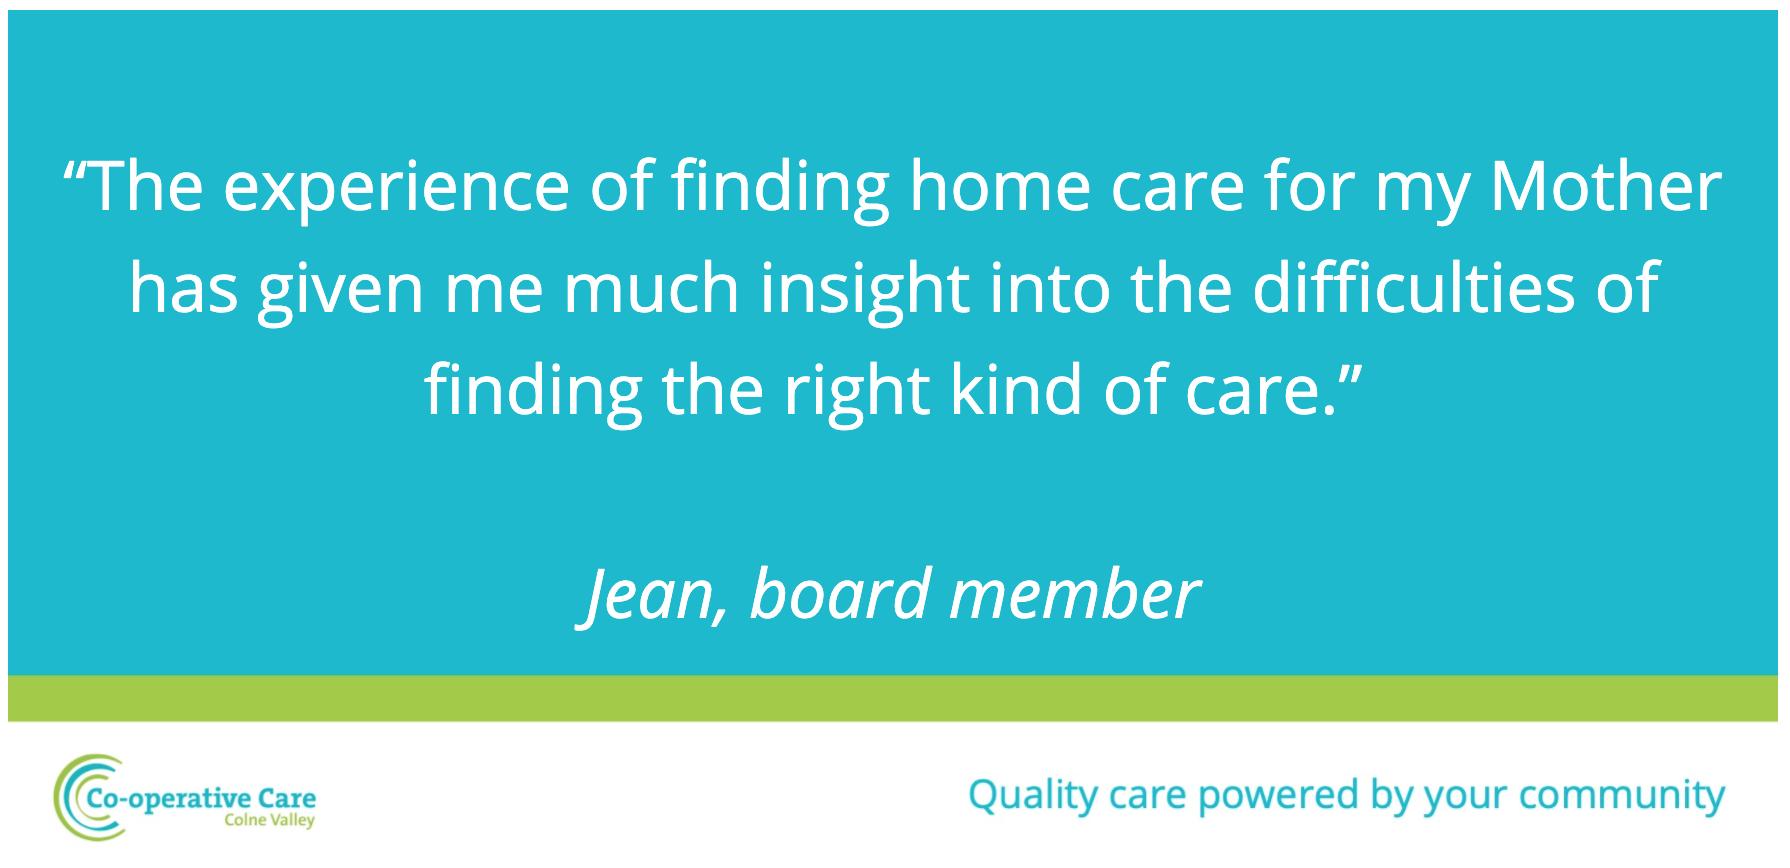 Team spotlight on sourcing home care